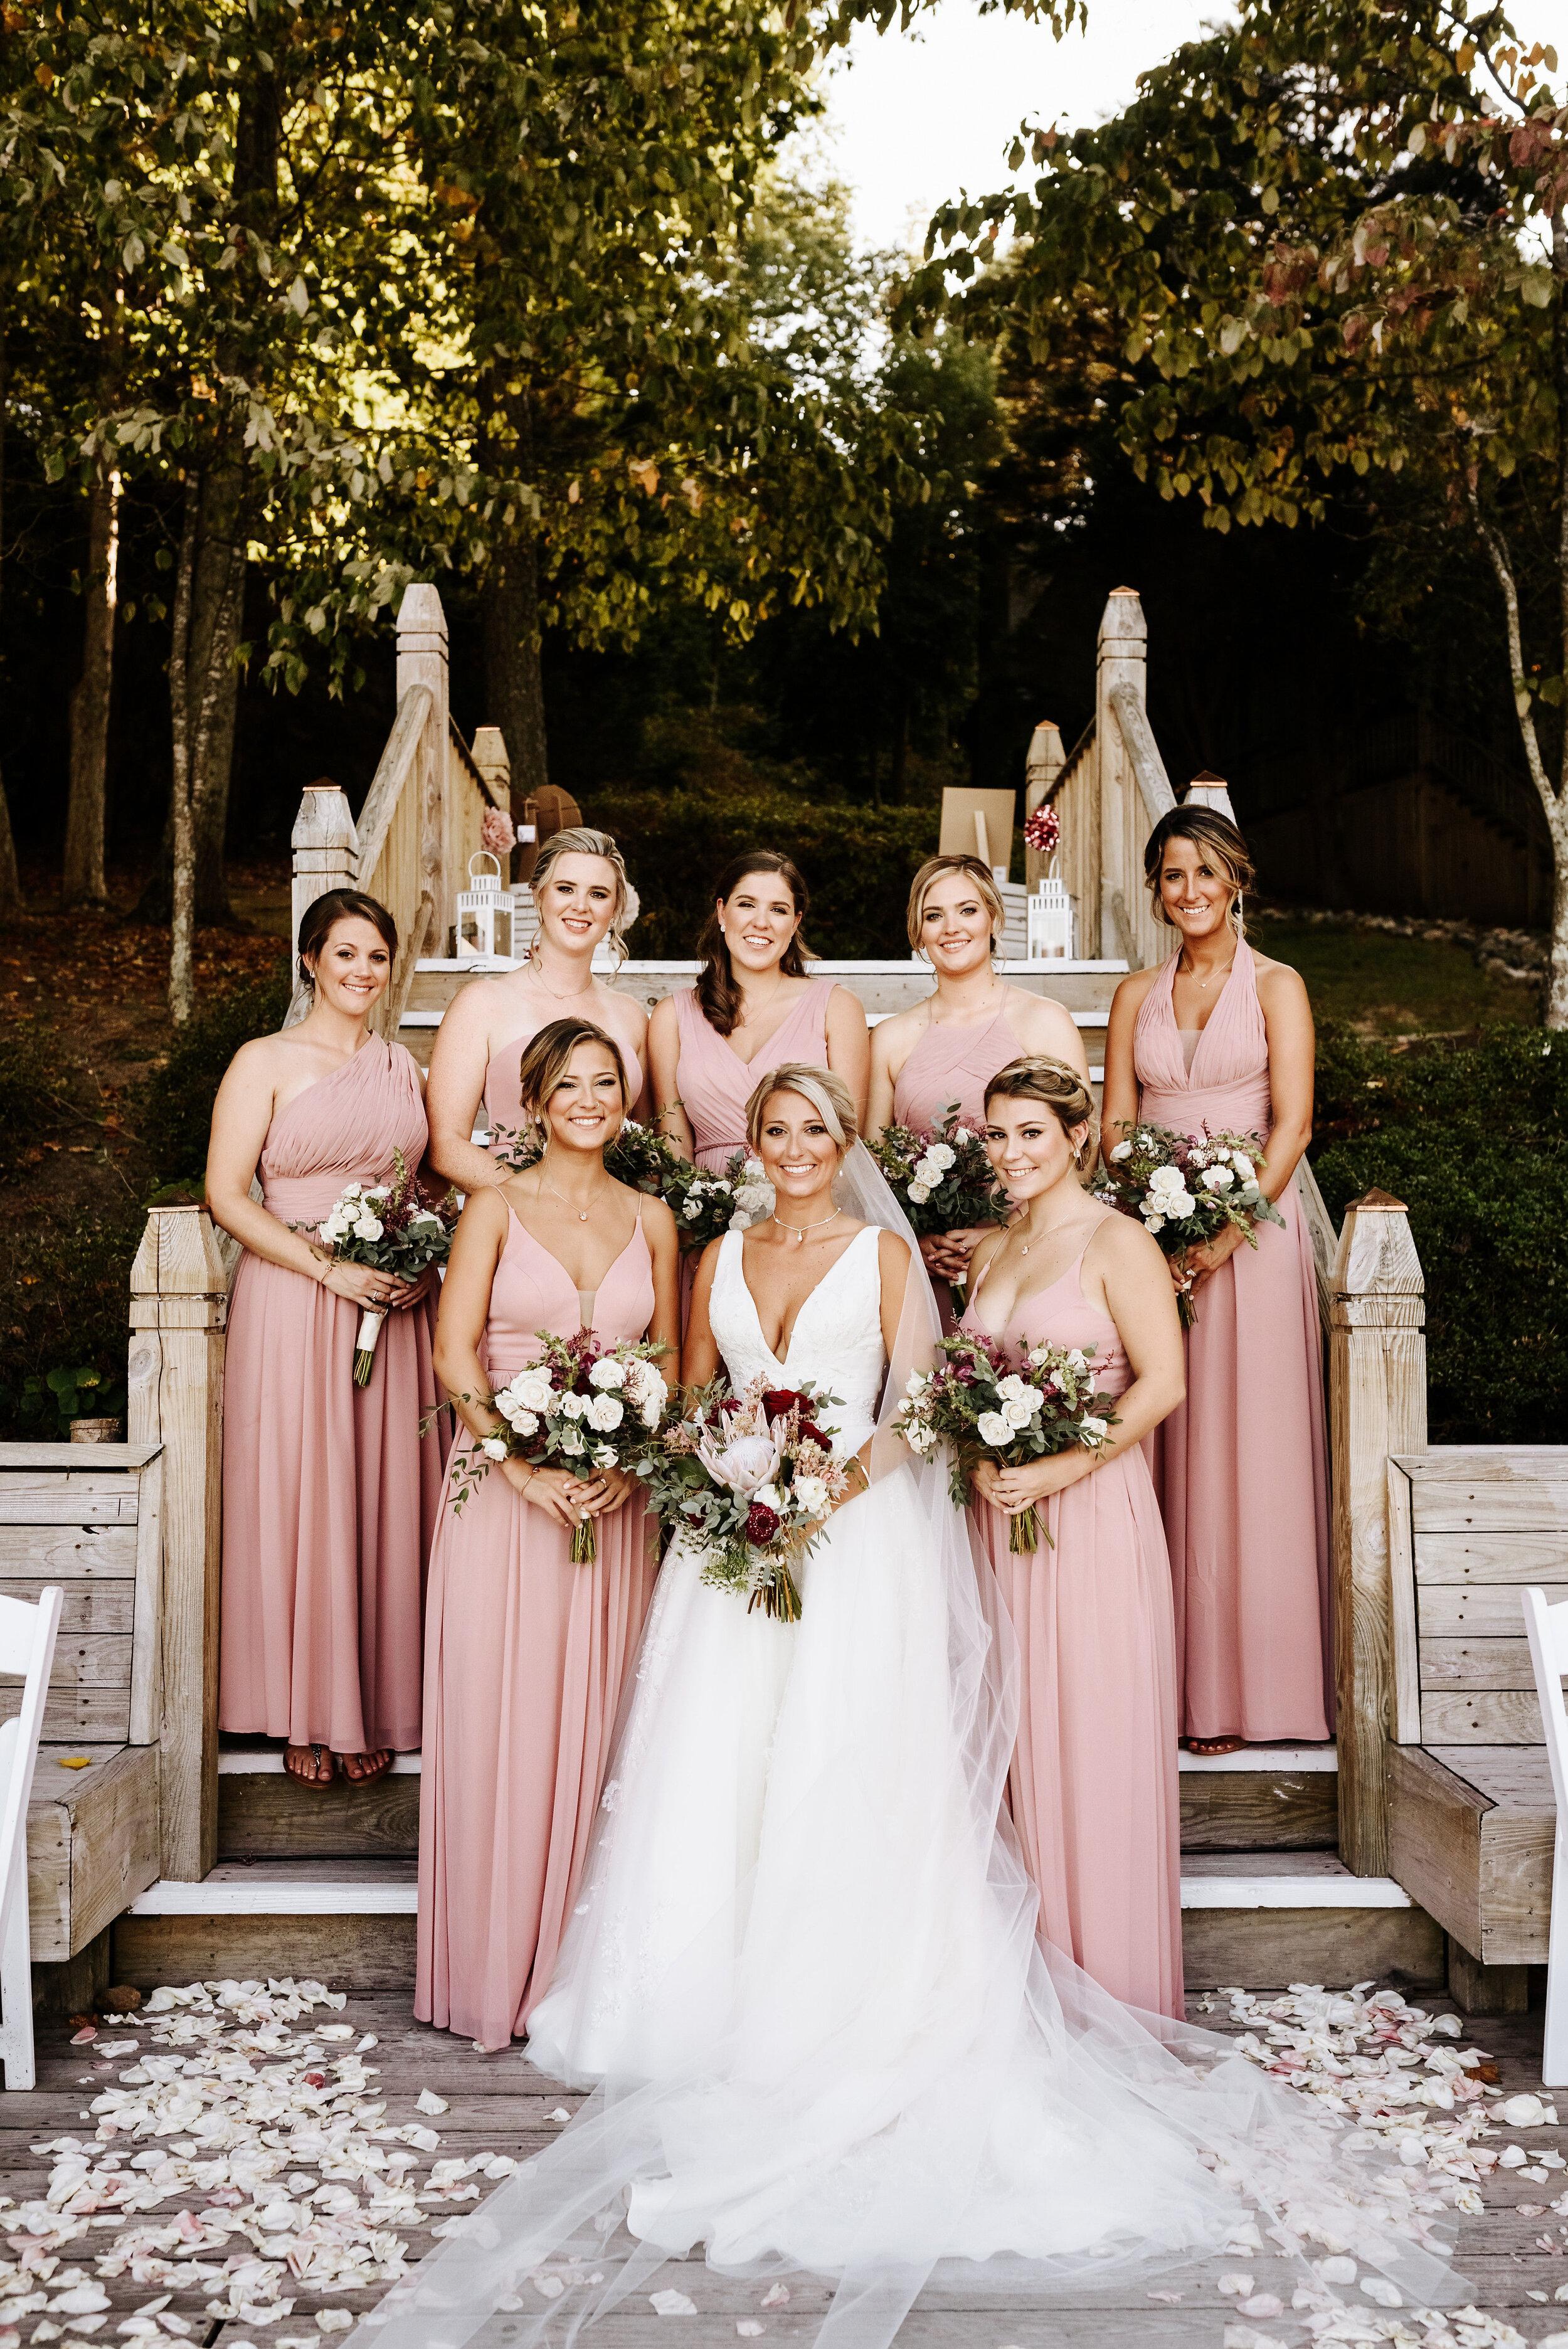 Emily_Mike_Wedding_Celebrations_at_the_Reservoir_Pool_Pavilion_Richmond_Virginia_Wedding_Photographer_Photography_by_V_67.jpg